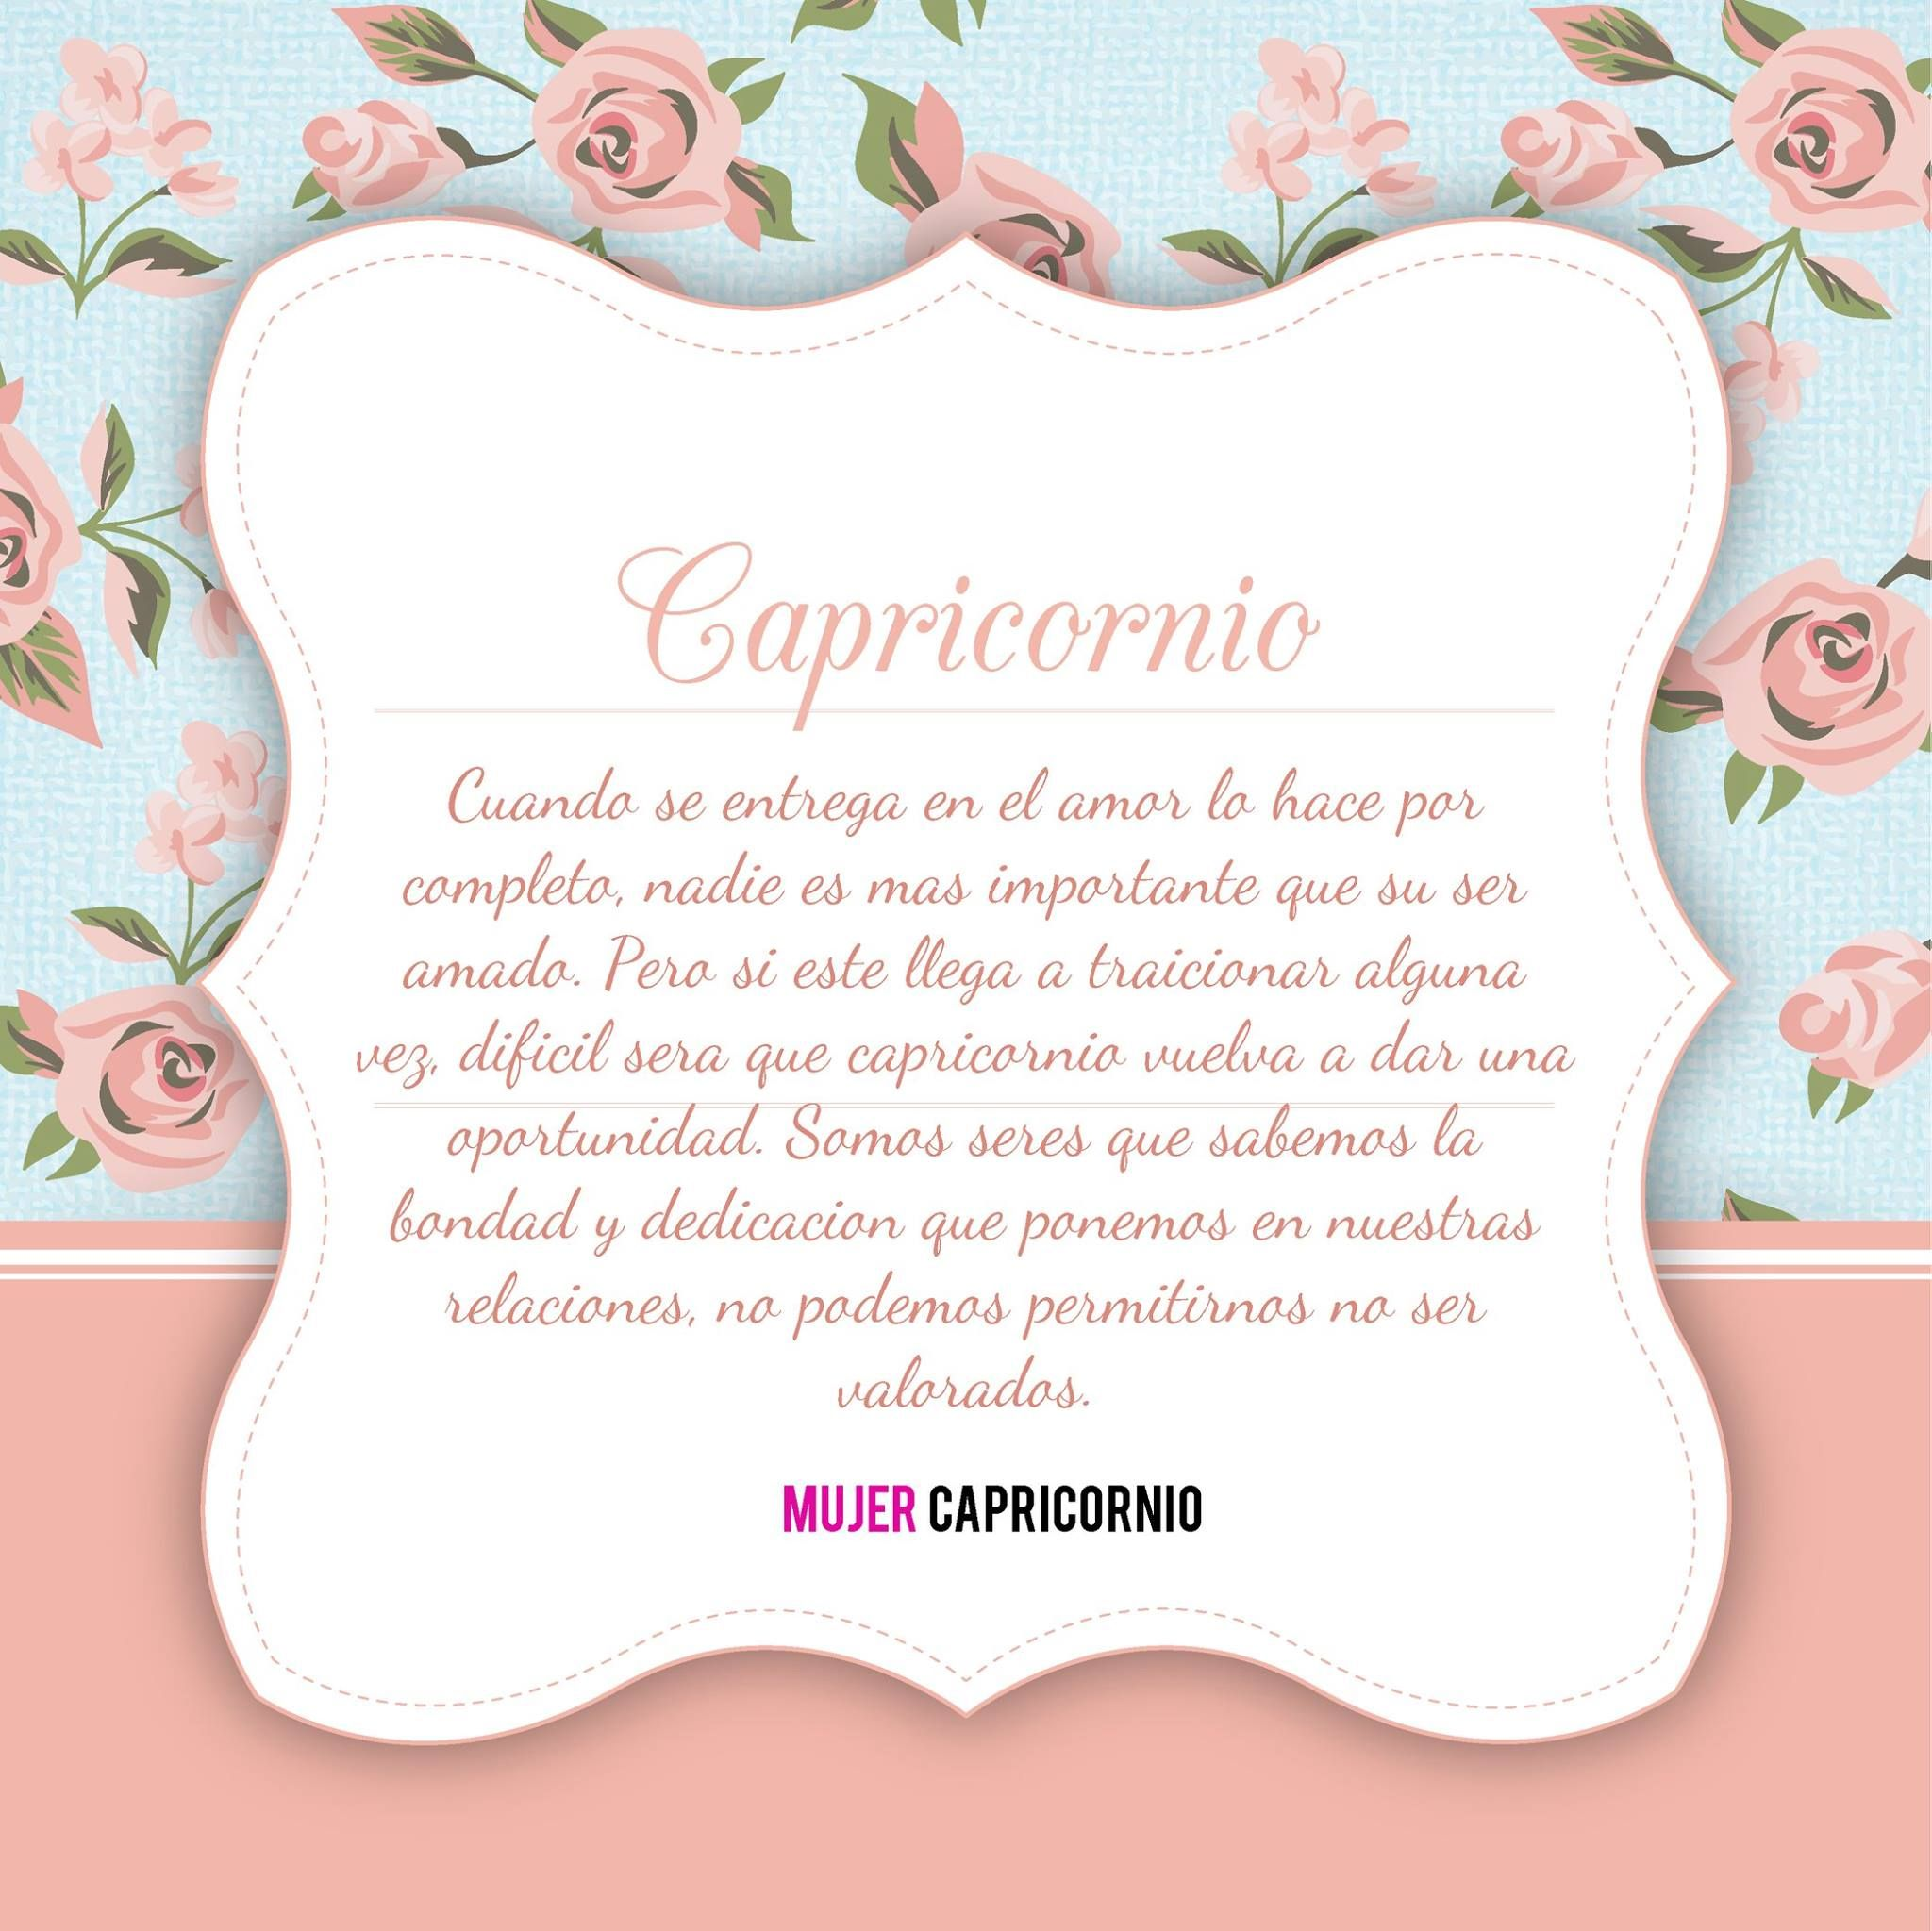 La mujer capricornio en el amor [PUNIQRANDLINE-(au-dating-names.txt) 30